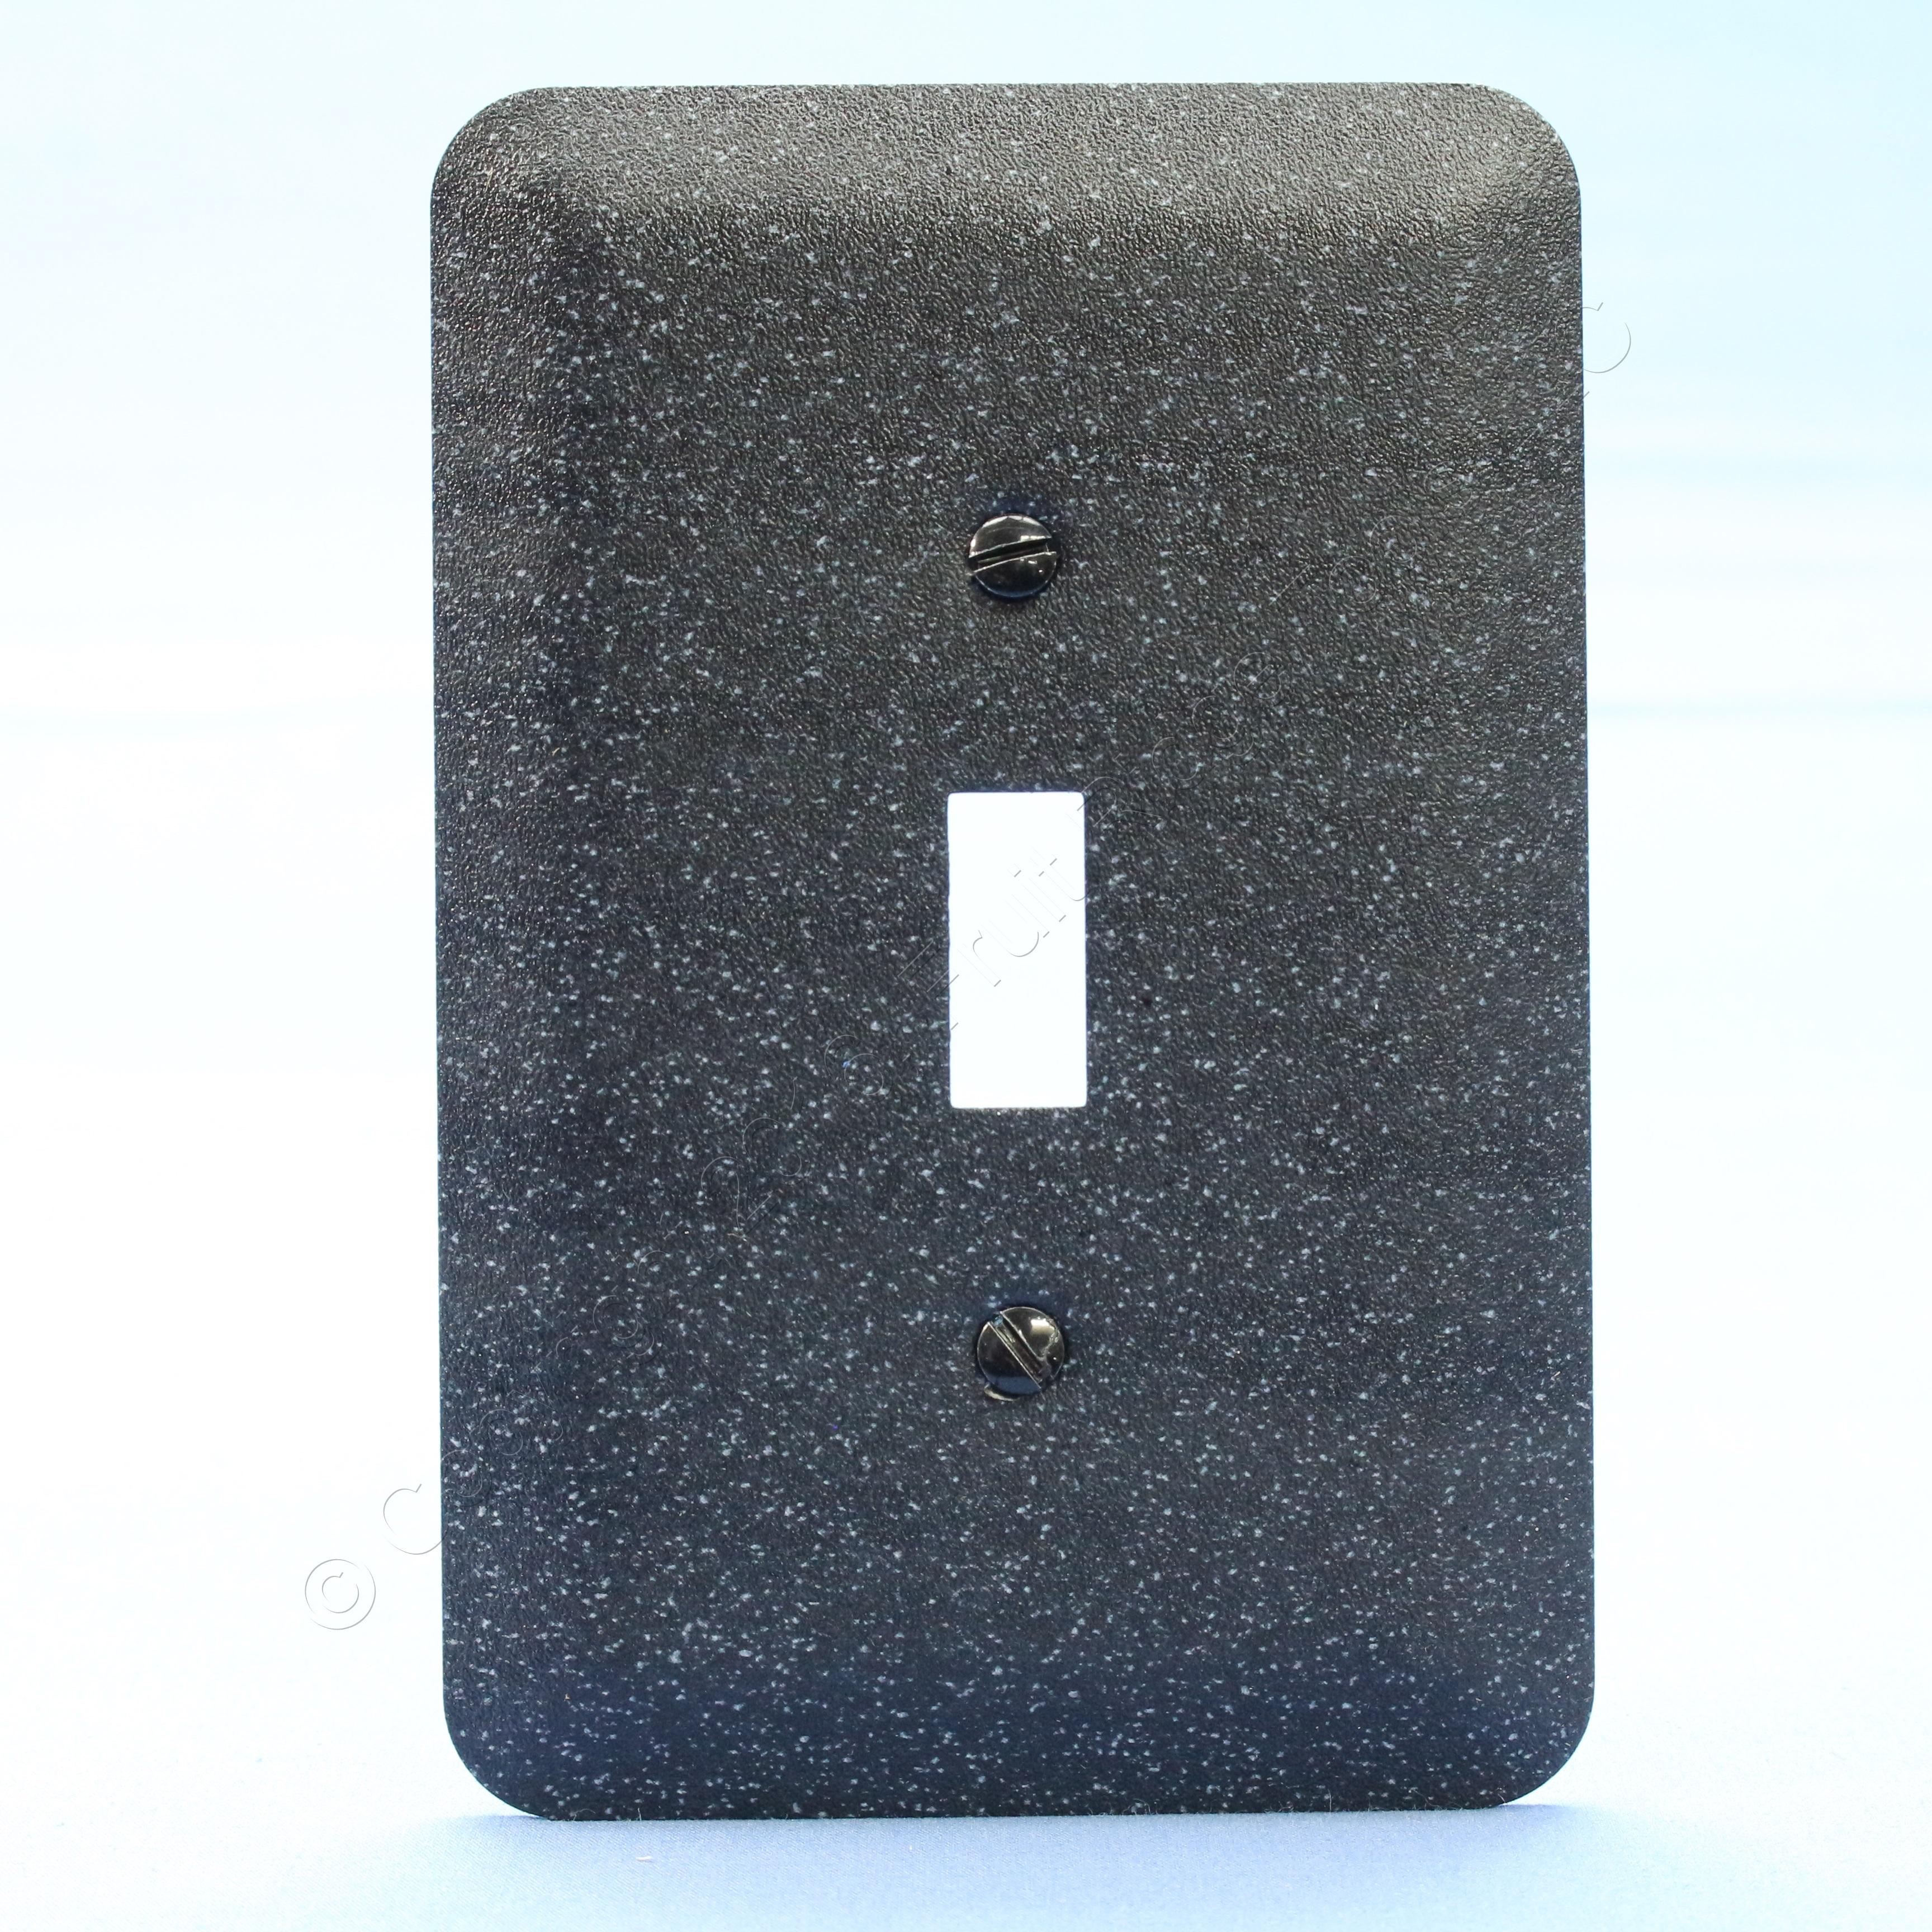 New Leviton JUMBO Black Granite Metal Decorative Light Switc